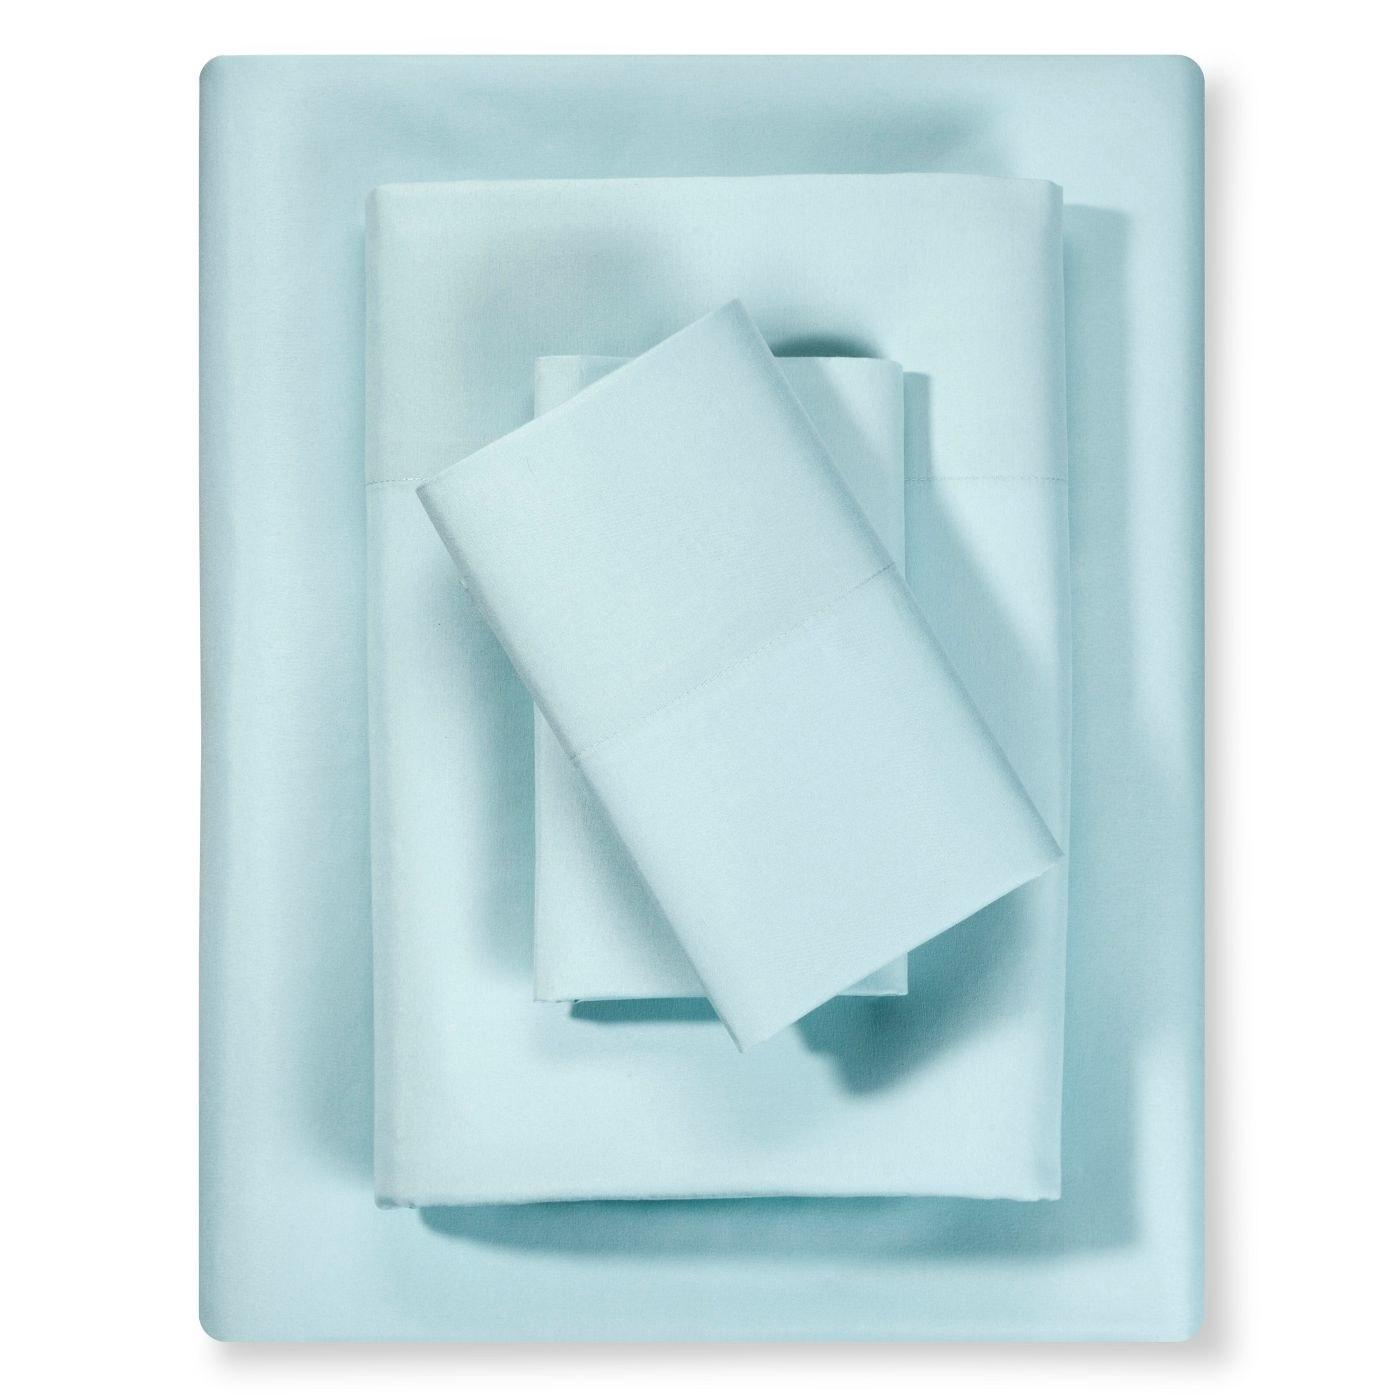 A set of blue microfiber sheets